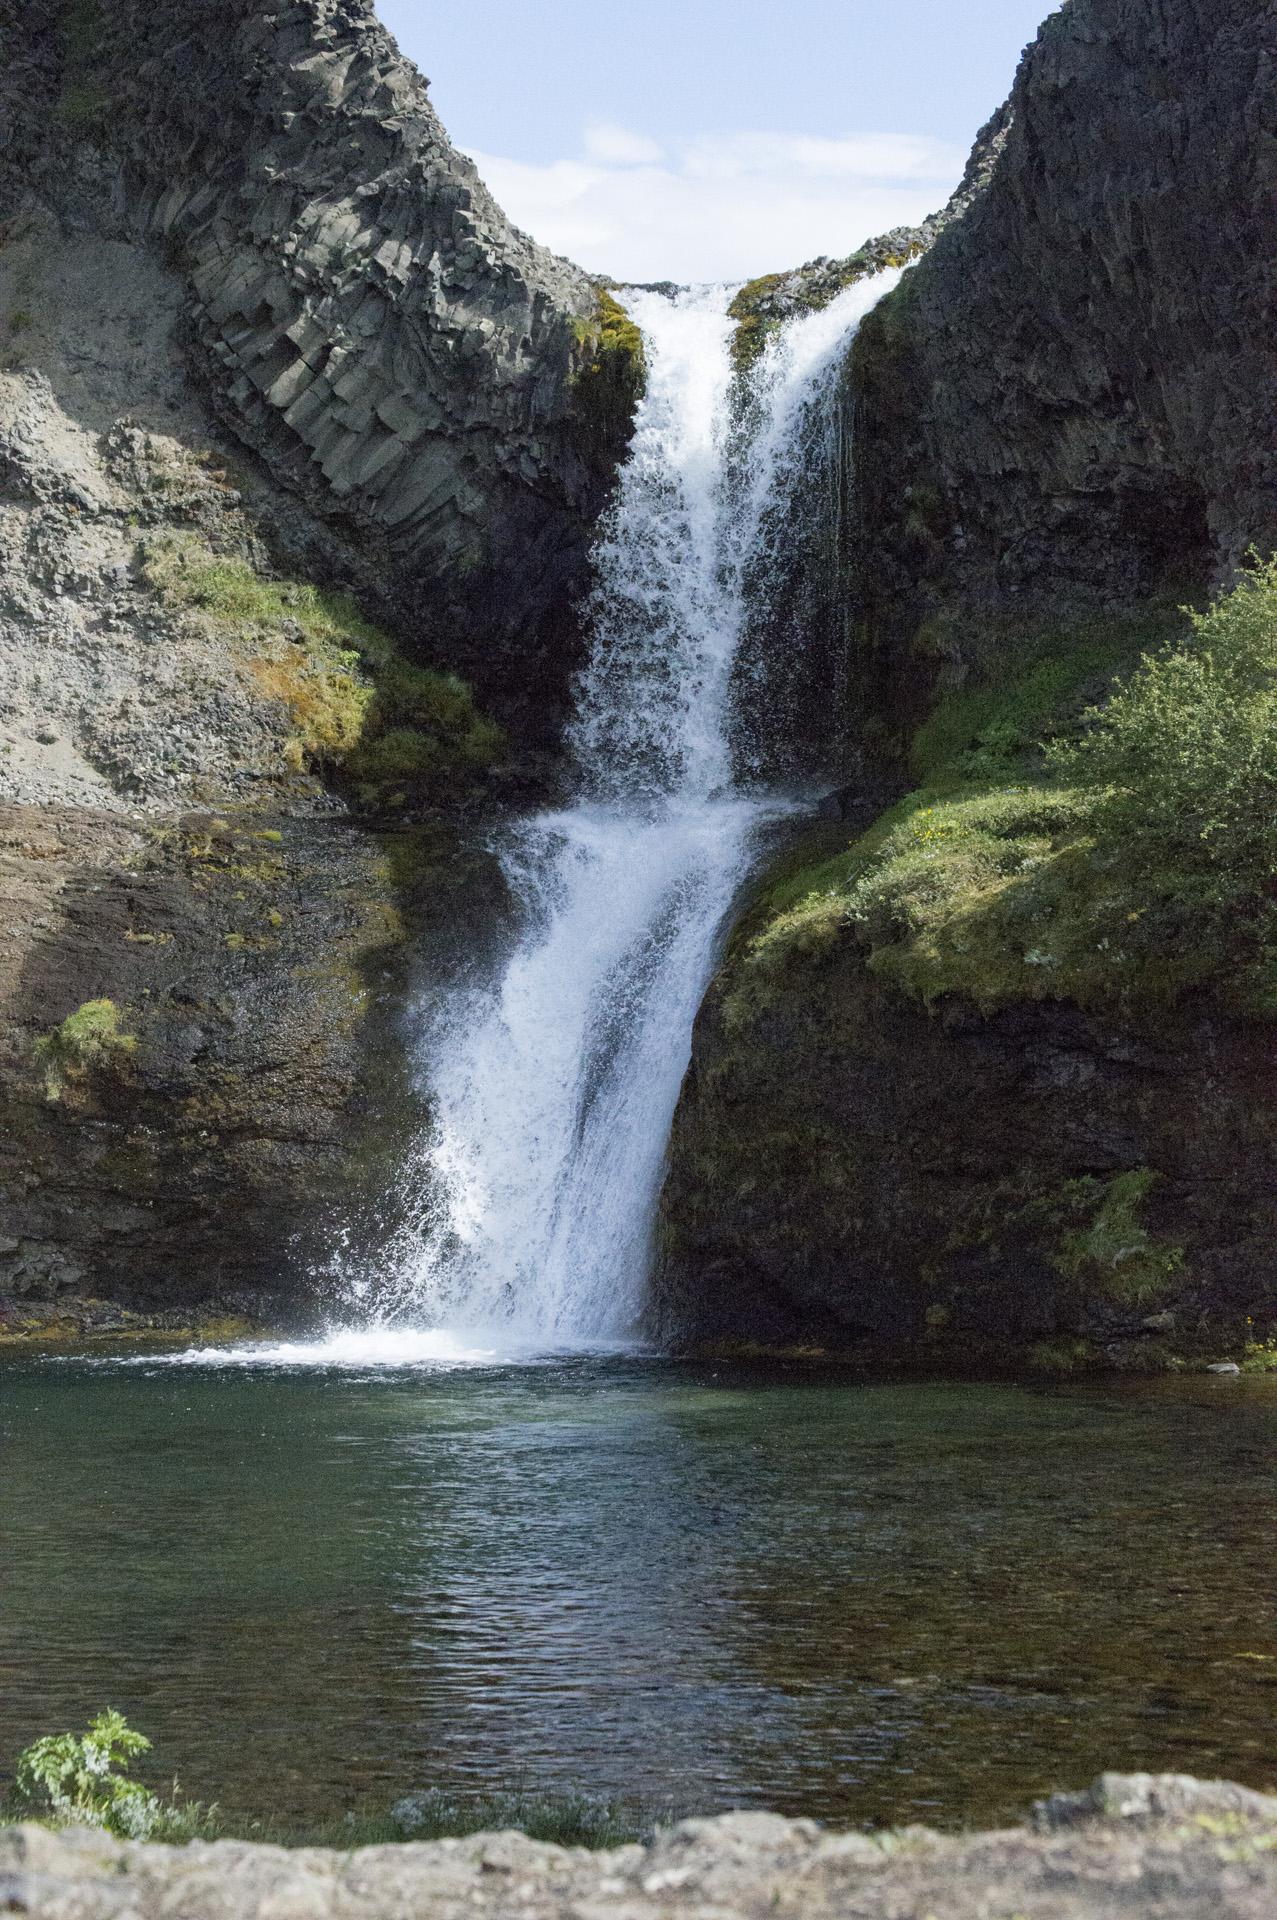 Gjárfoss waterfall, Gjáin area, Þjórsárdalur valley, Árnessýsla, Suðurland region, Iceland.